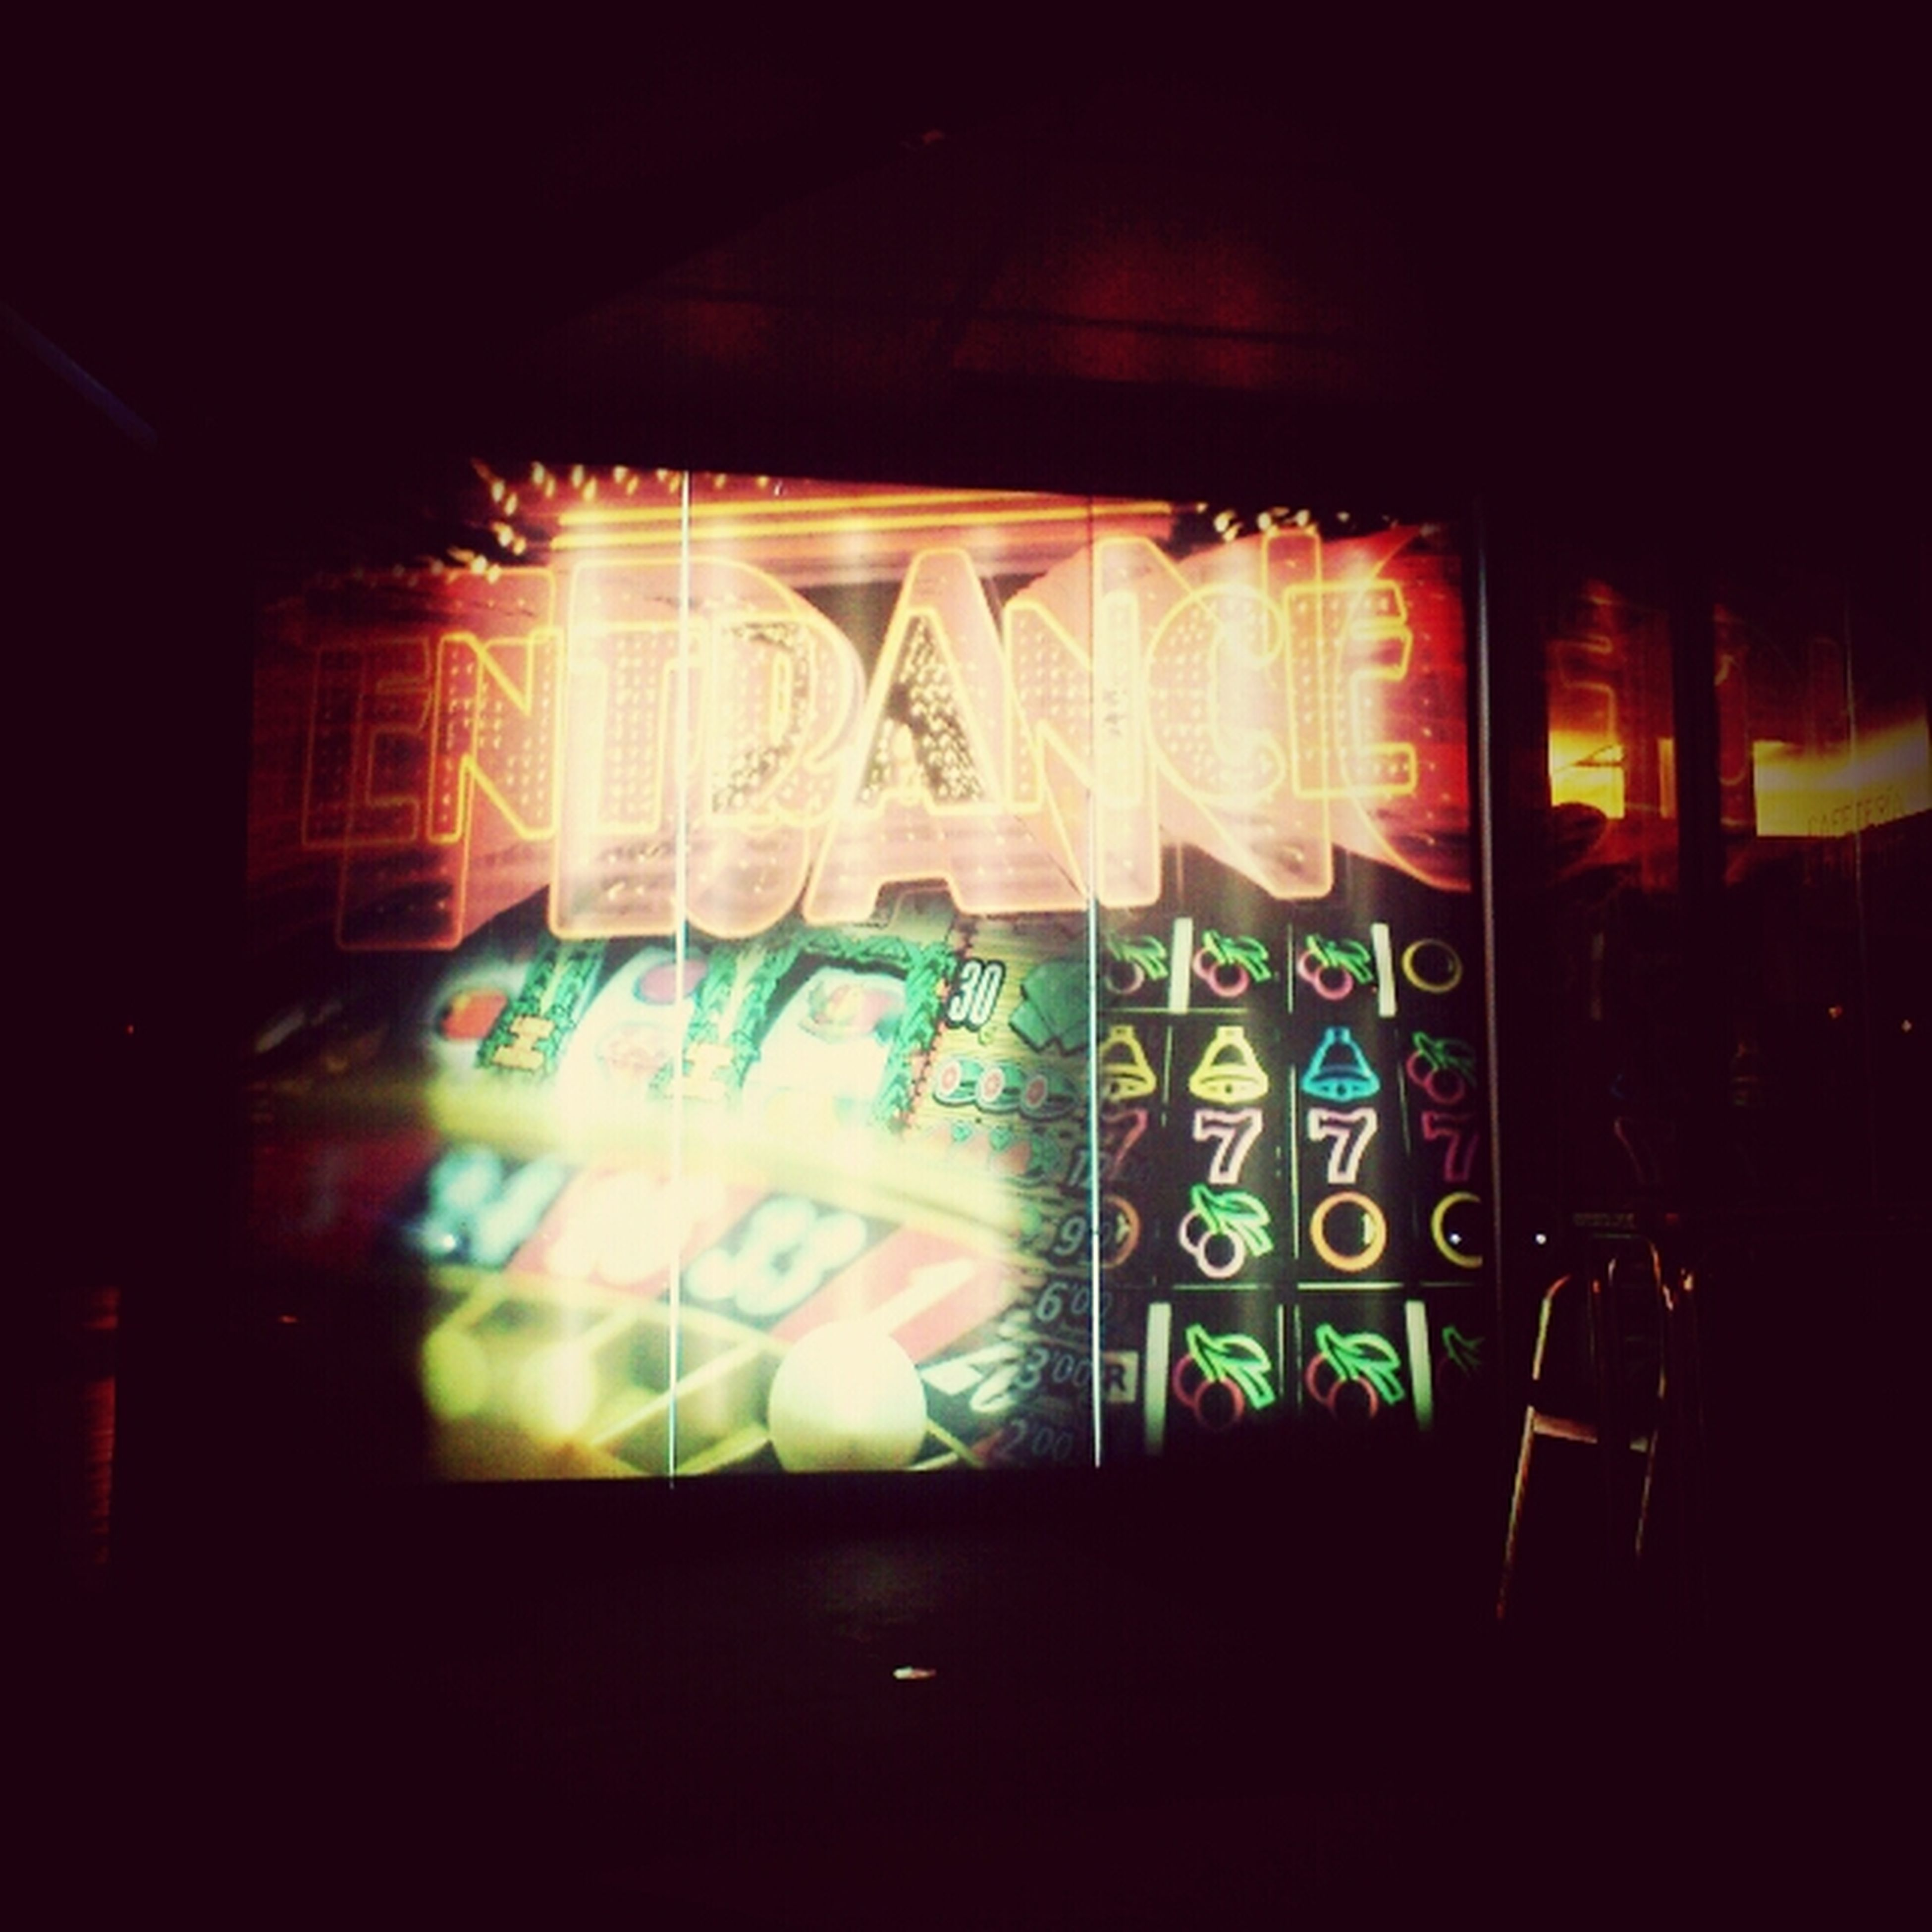 indoors, art, graffiti, illuminated, art and craft, creativity, multi colored, window, text, wall - building feature, built structure, dark, human representation, glass - material, no people, interior, architecture, night, western script, design